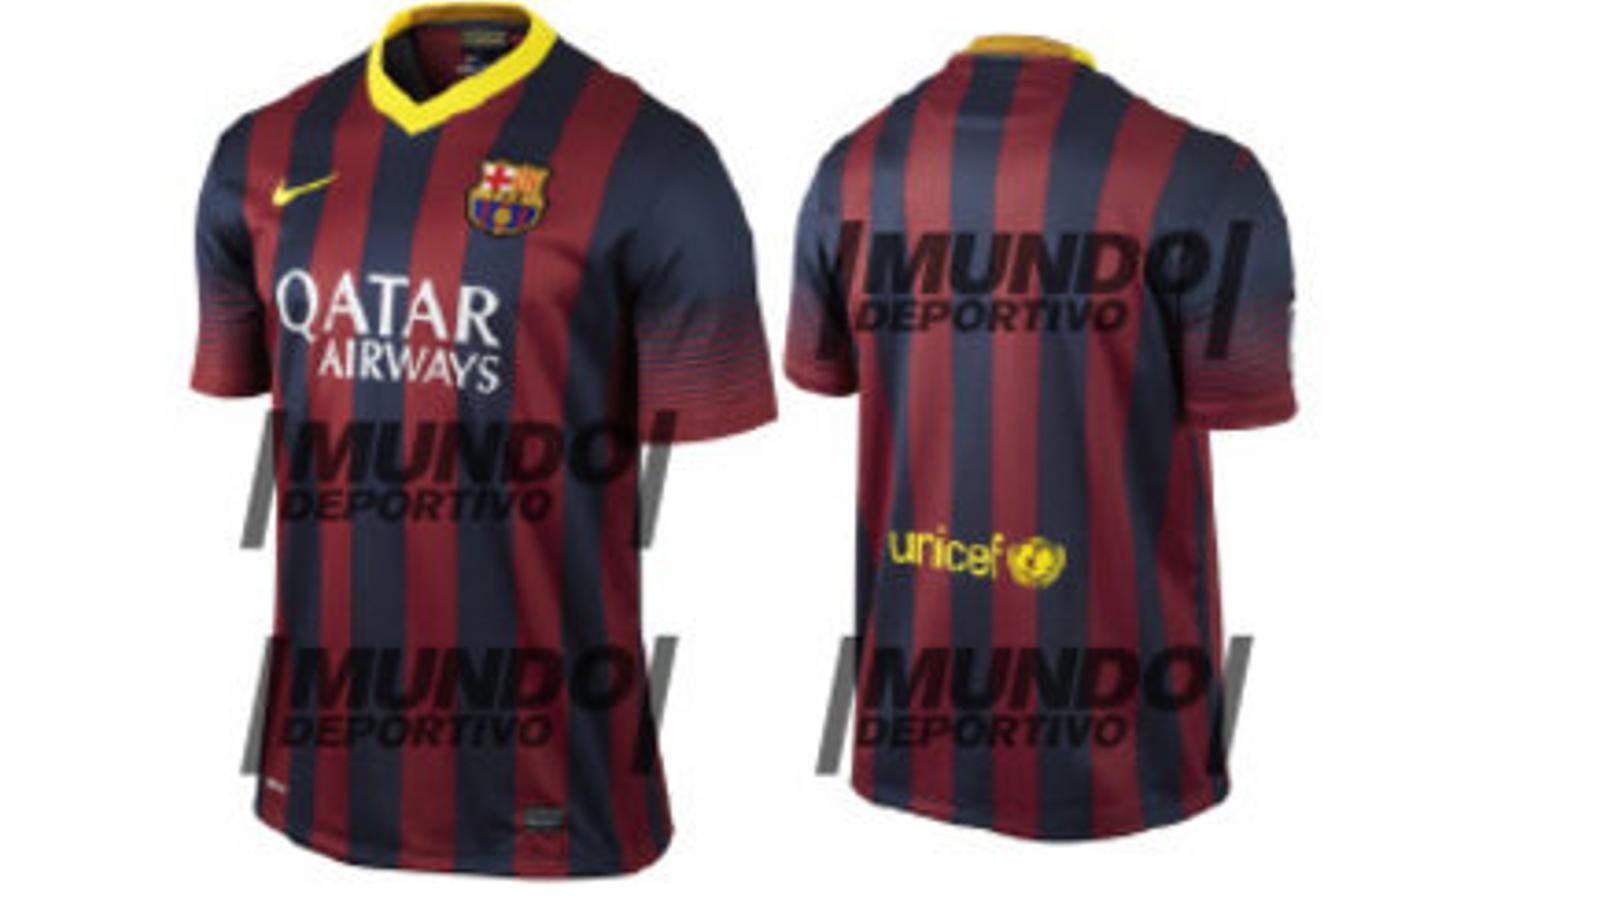 Mundo Deportivo  publica el disseny definitiu de la samarreta del Barça a20ab29ae5f